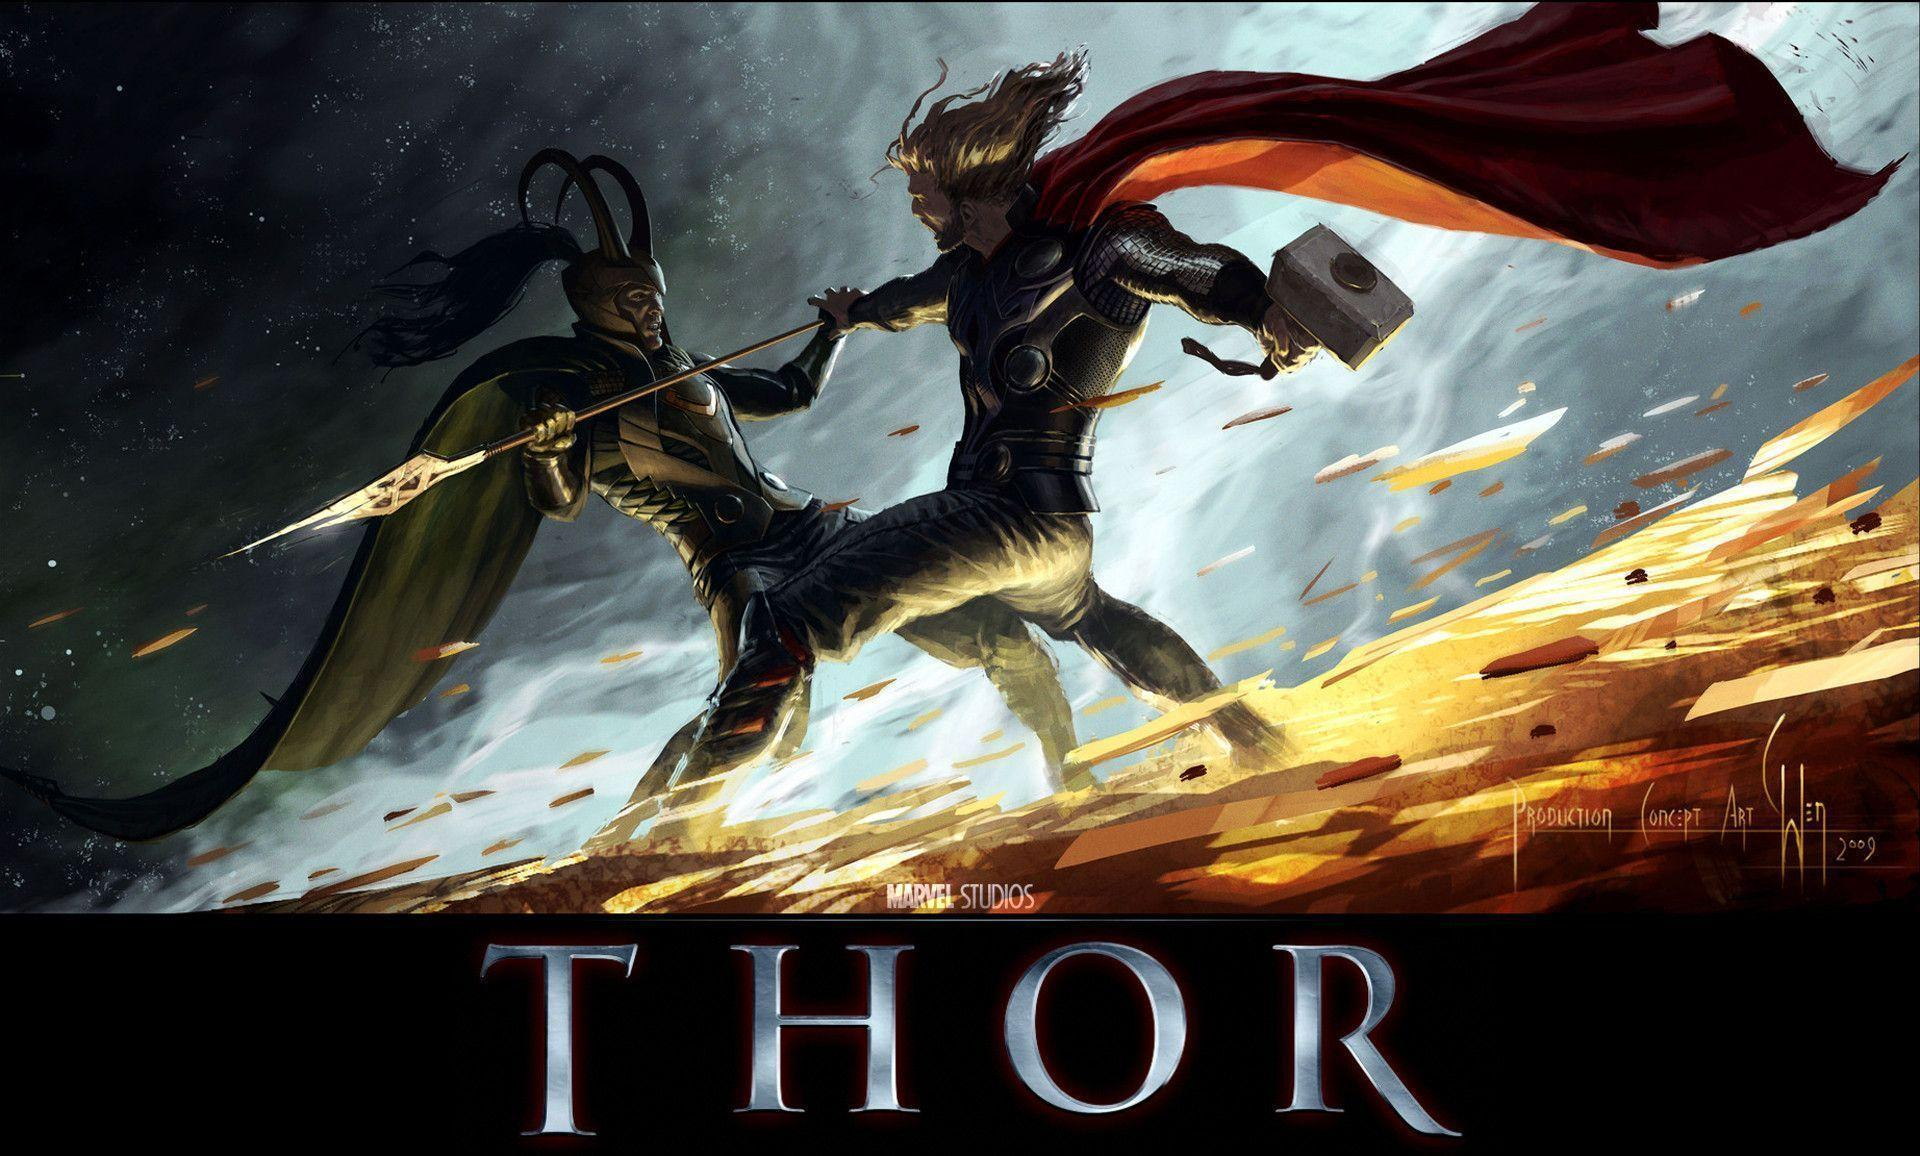 Thor Wallpaper: Thor Wallpaper Desktop #2239  .Ssofc